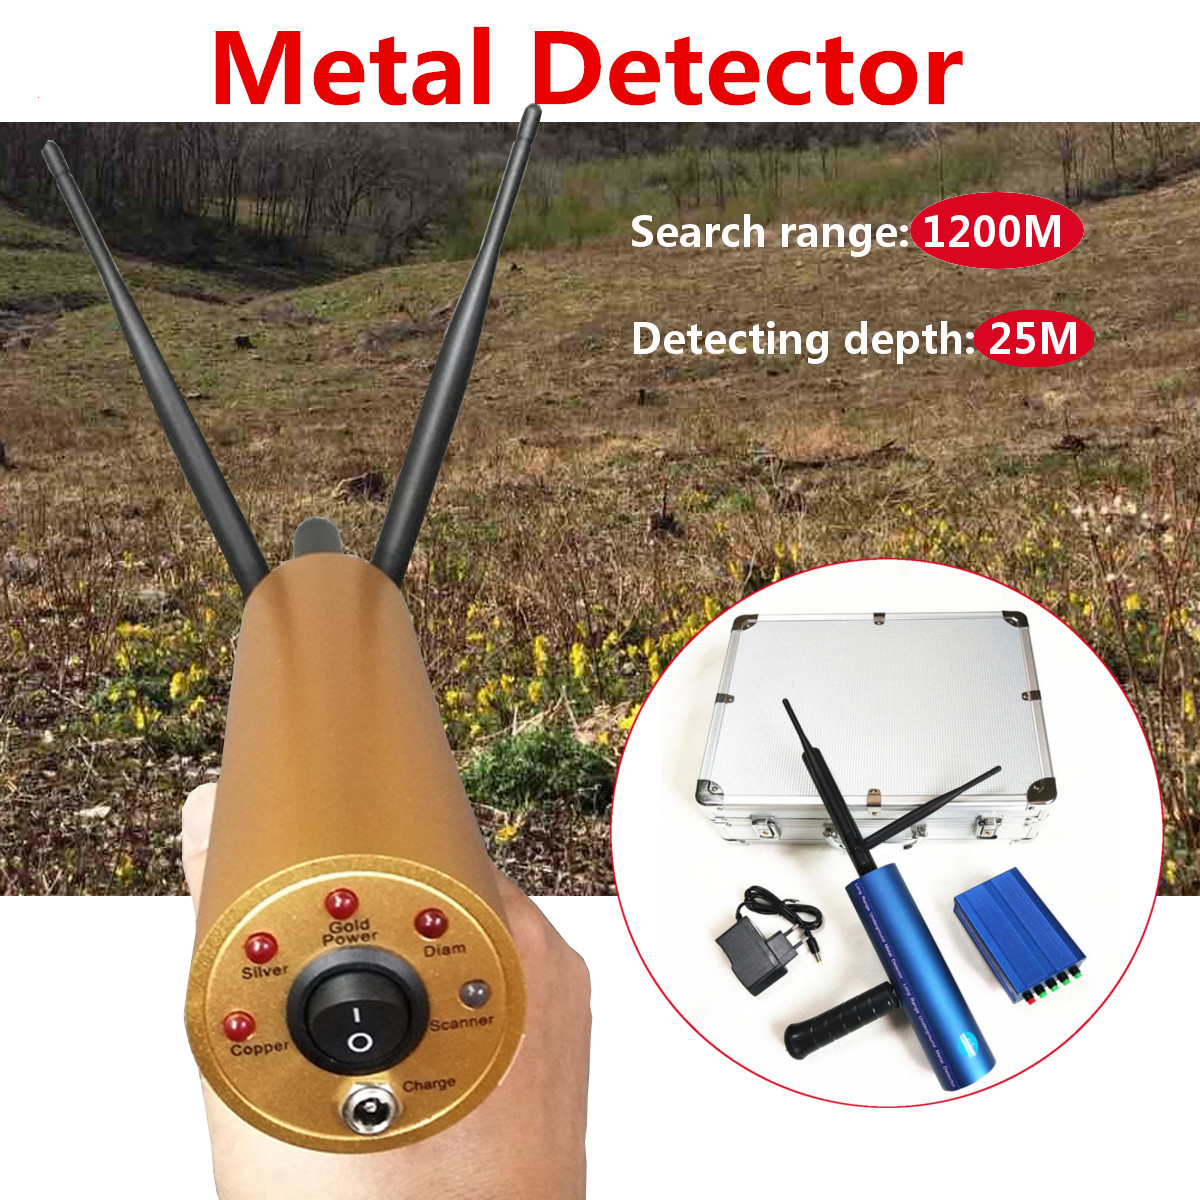 Professtional Metro Gold Metal Detector 1200 M Long Range Busca Tesouro Localizador Rastreador do Scanner Metal Detector Circuito